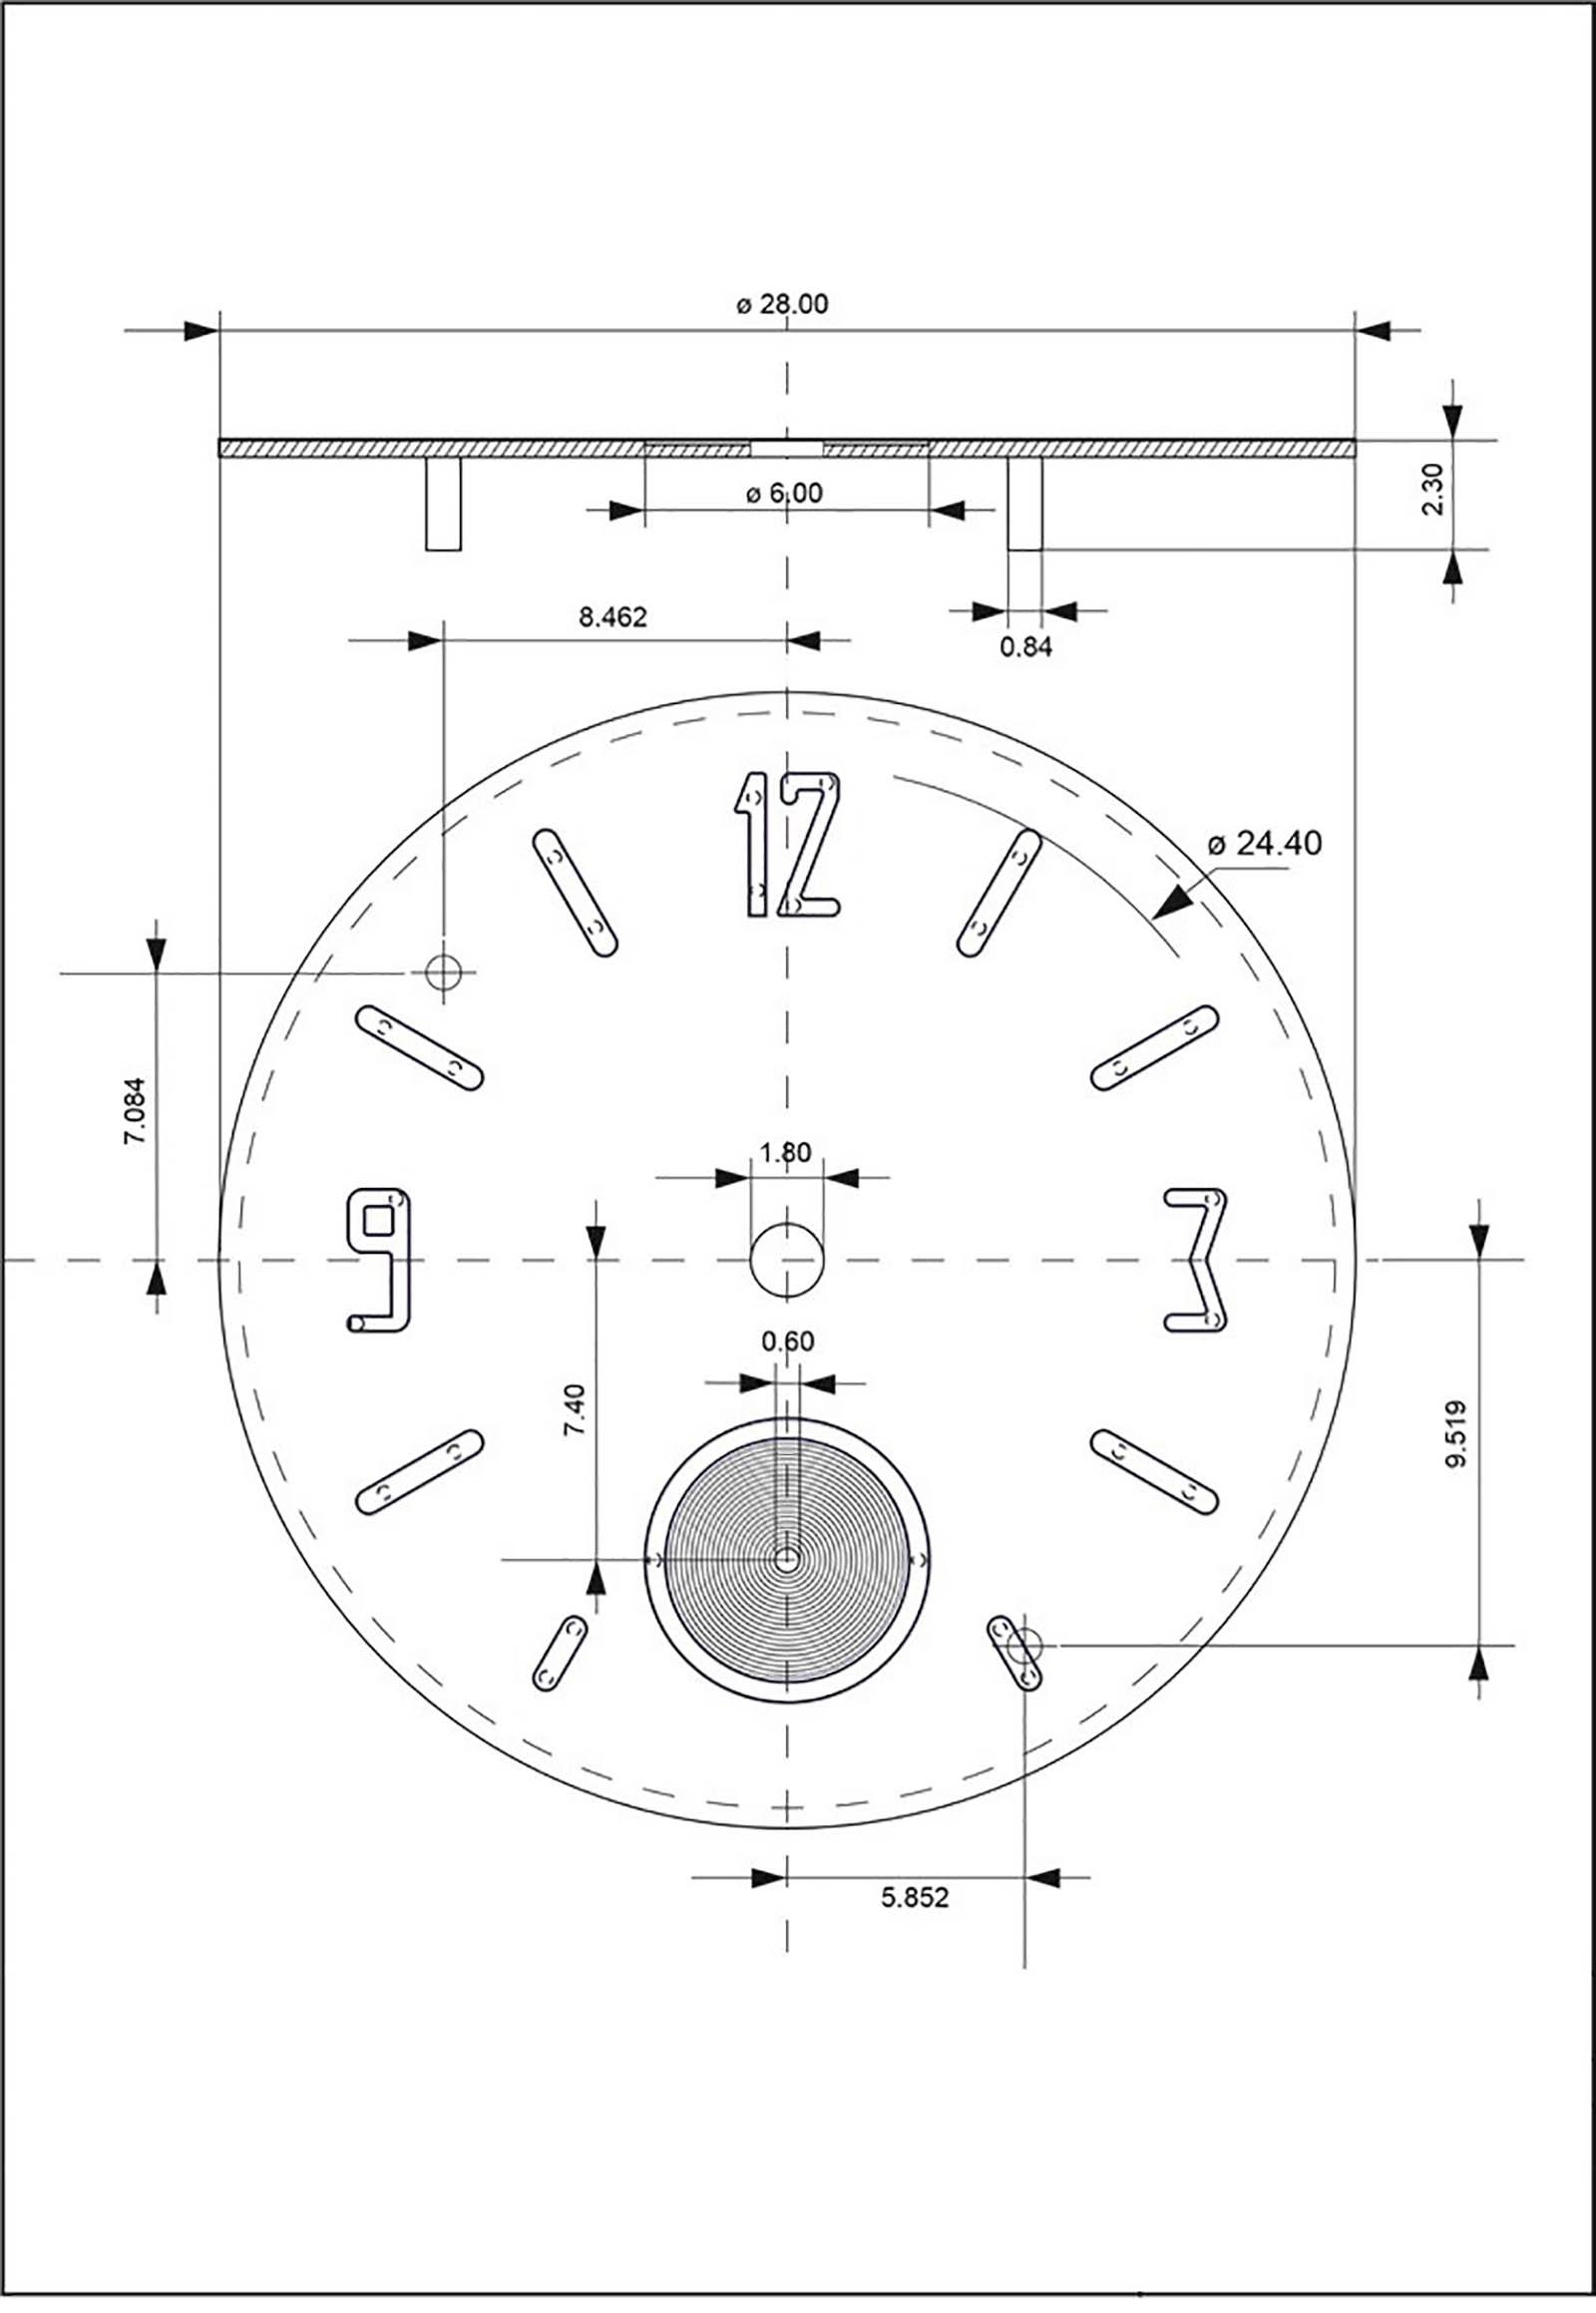 KHWCC-Dial design